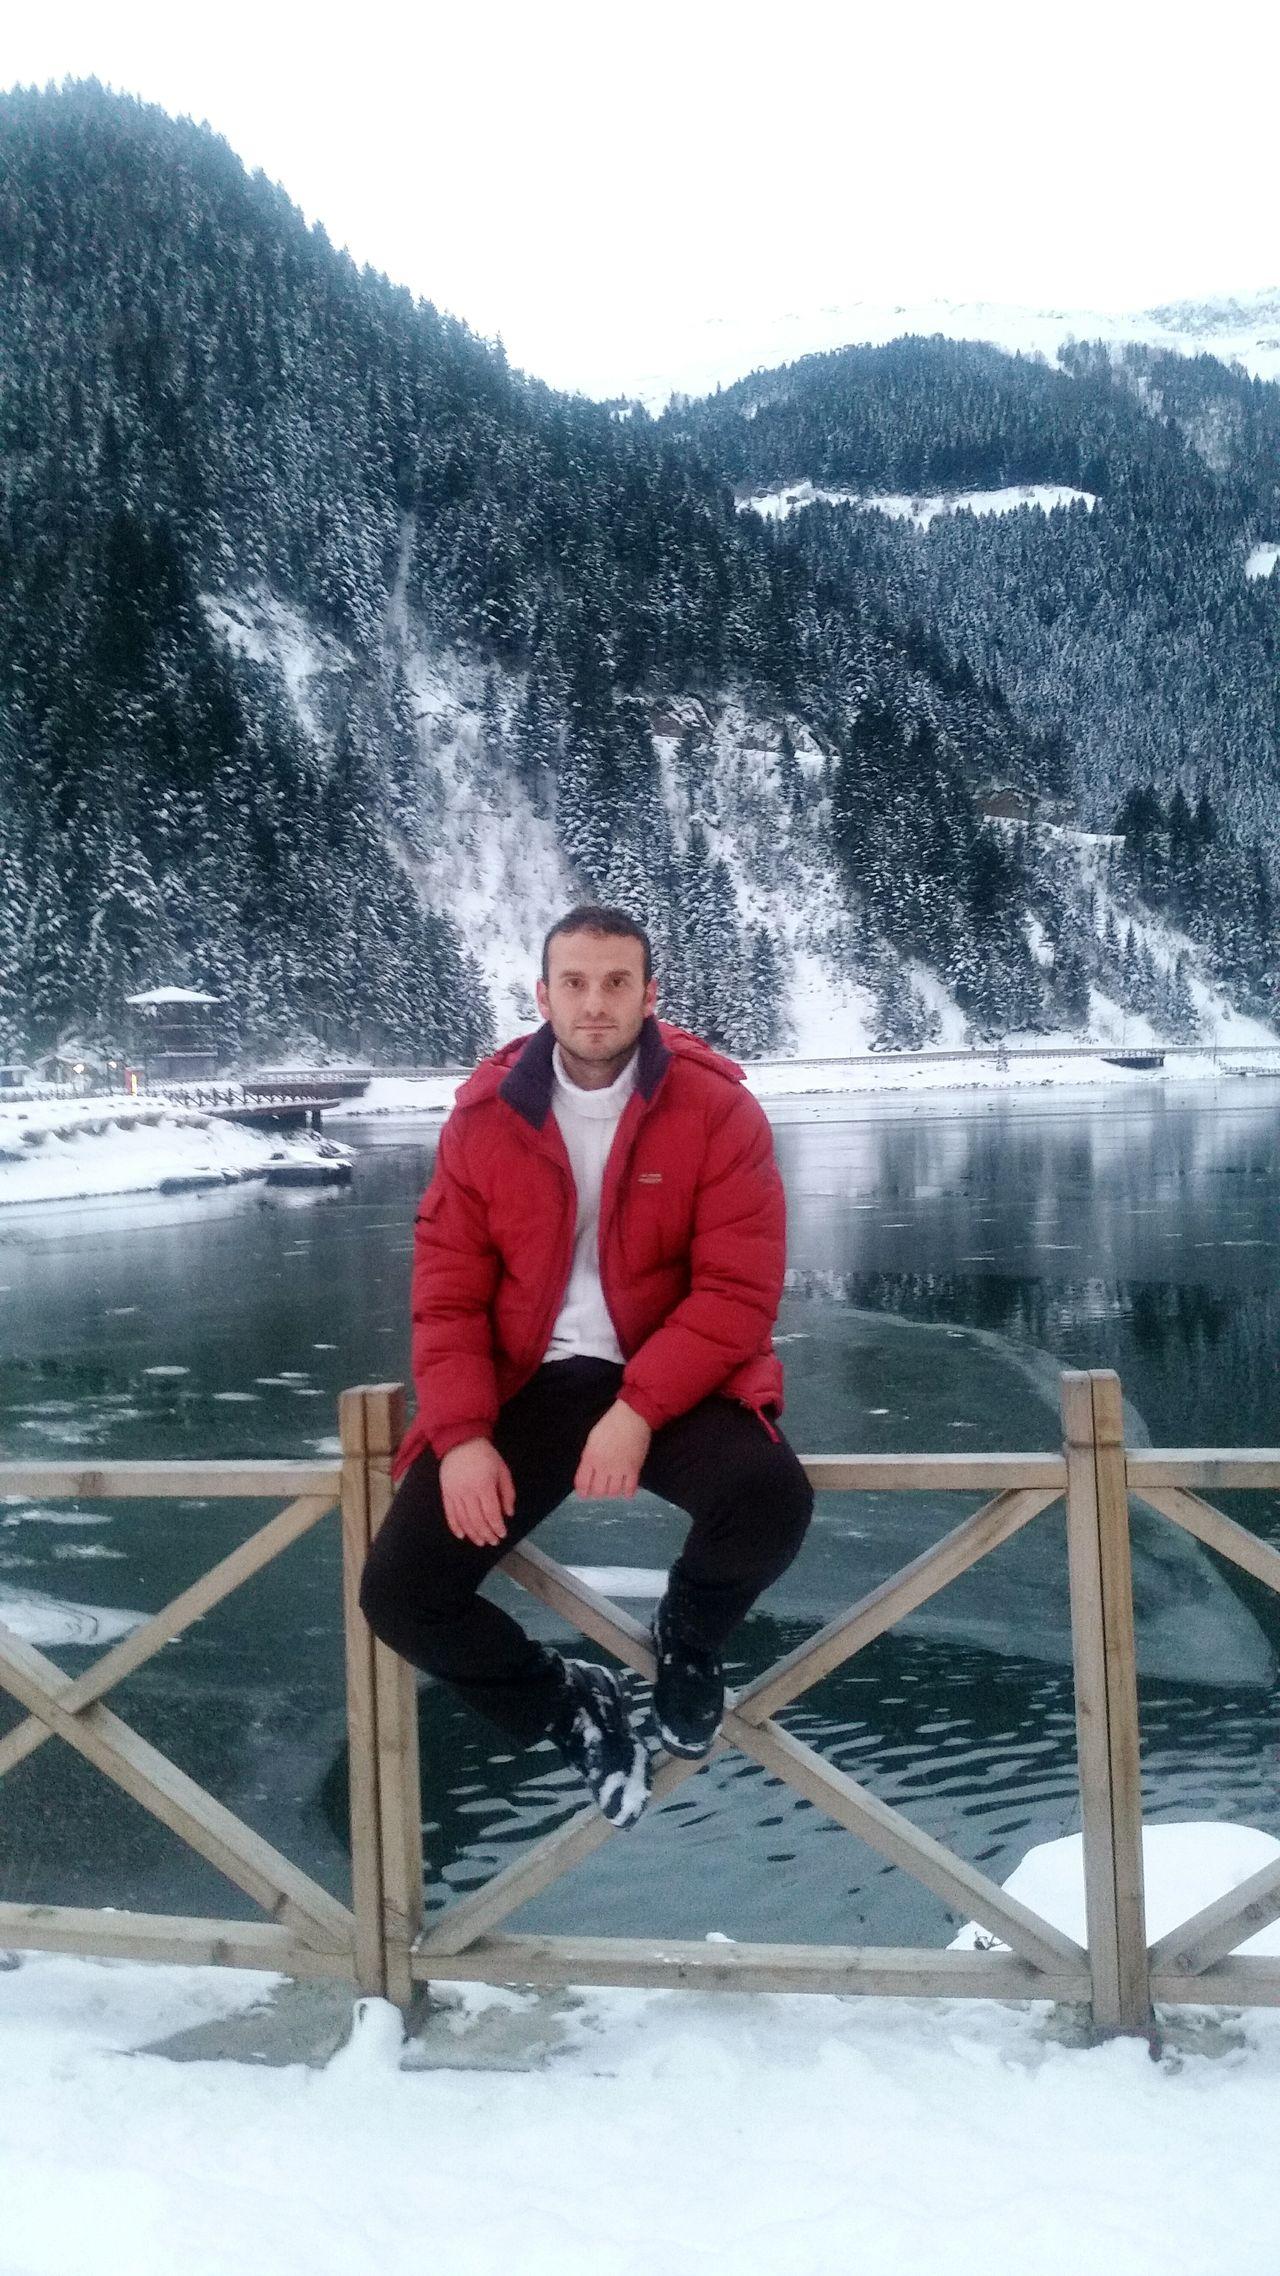 Uzungölden bir kış günü Uzungöl One Person One Man Only Water People Winter Sport Men Day Adult Sky Warm Clothing Trabzon Uzungol Turkey Samsung Galaxy S5 Huzur 💕 Taking Photos